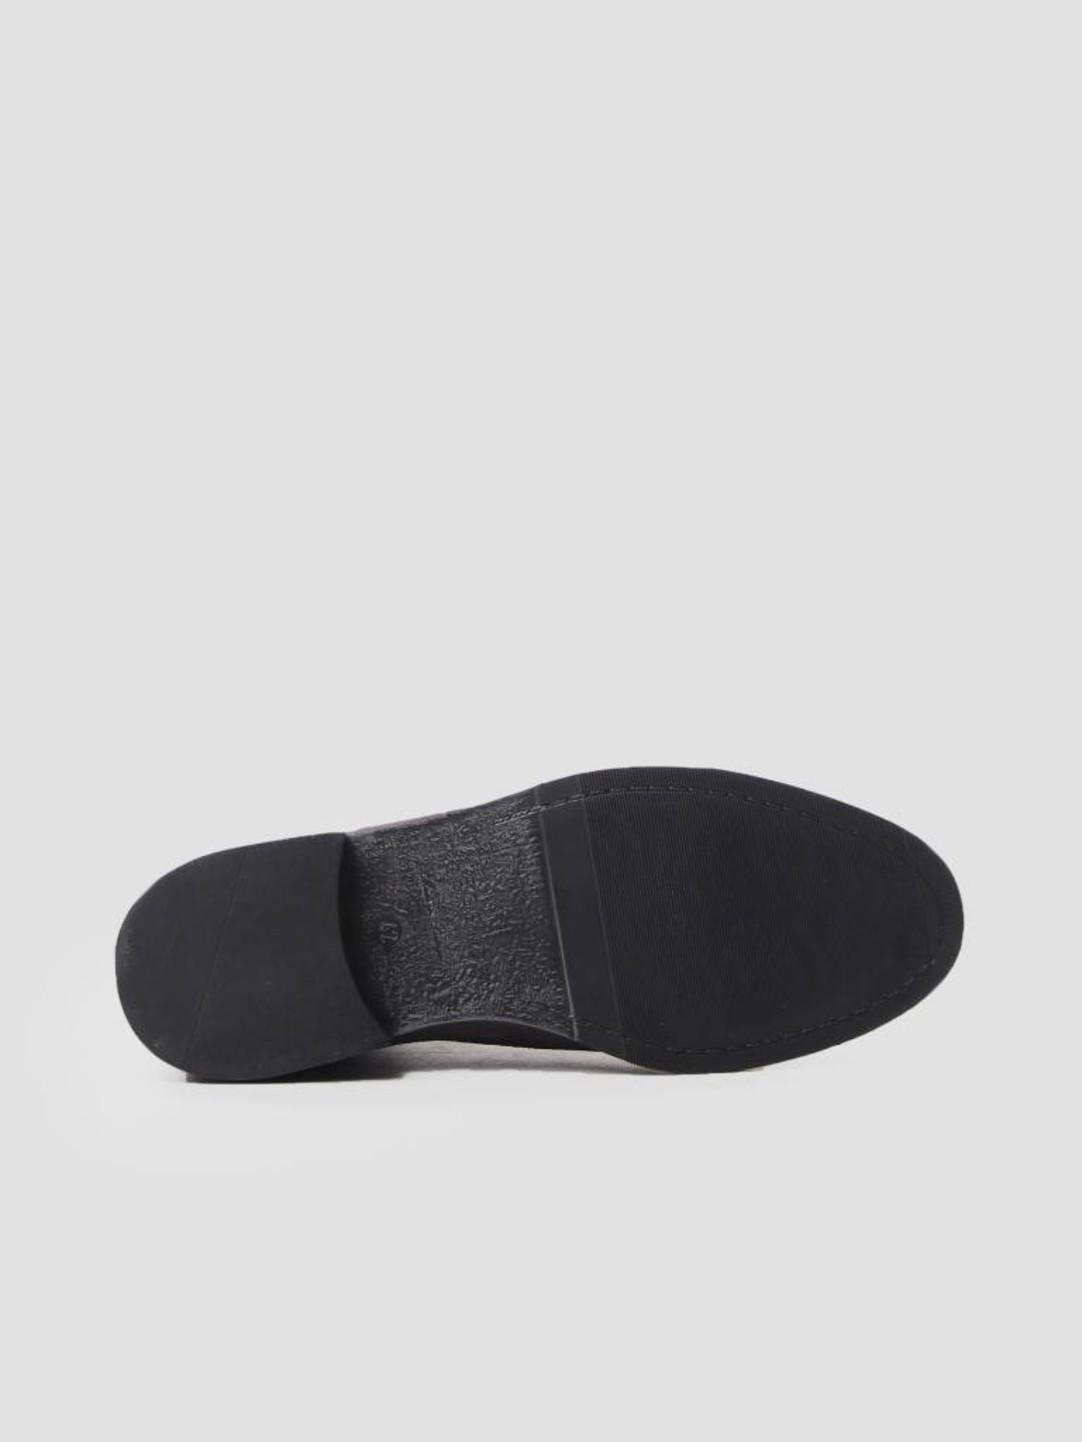 LEGENDS LEGENDS Chelsea Boots Grey 802-03-318